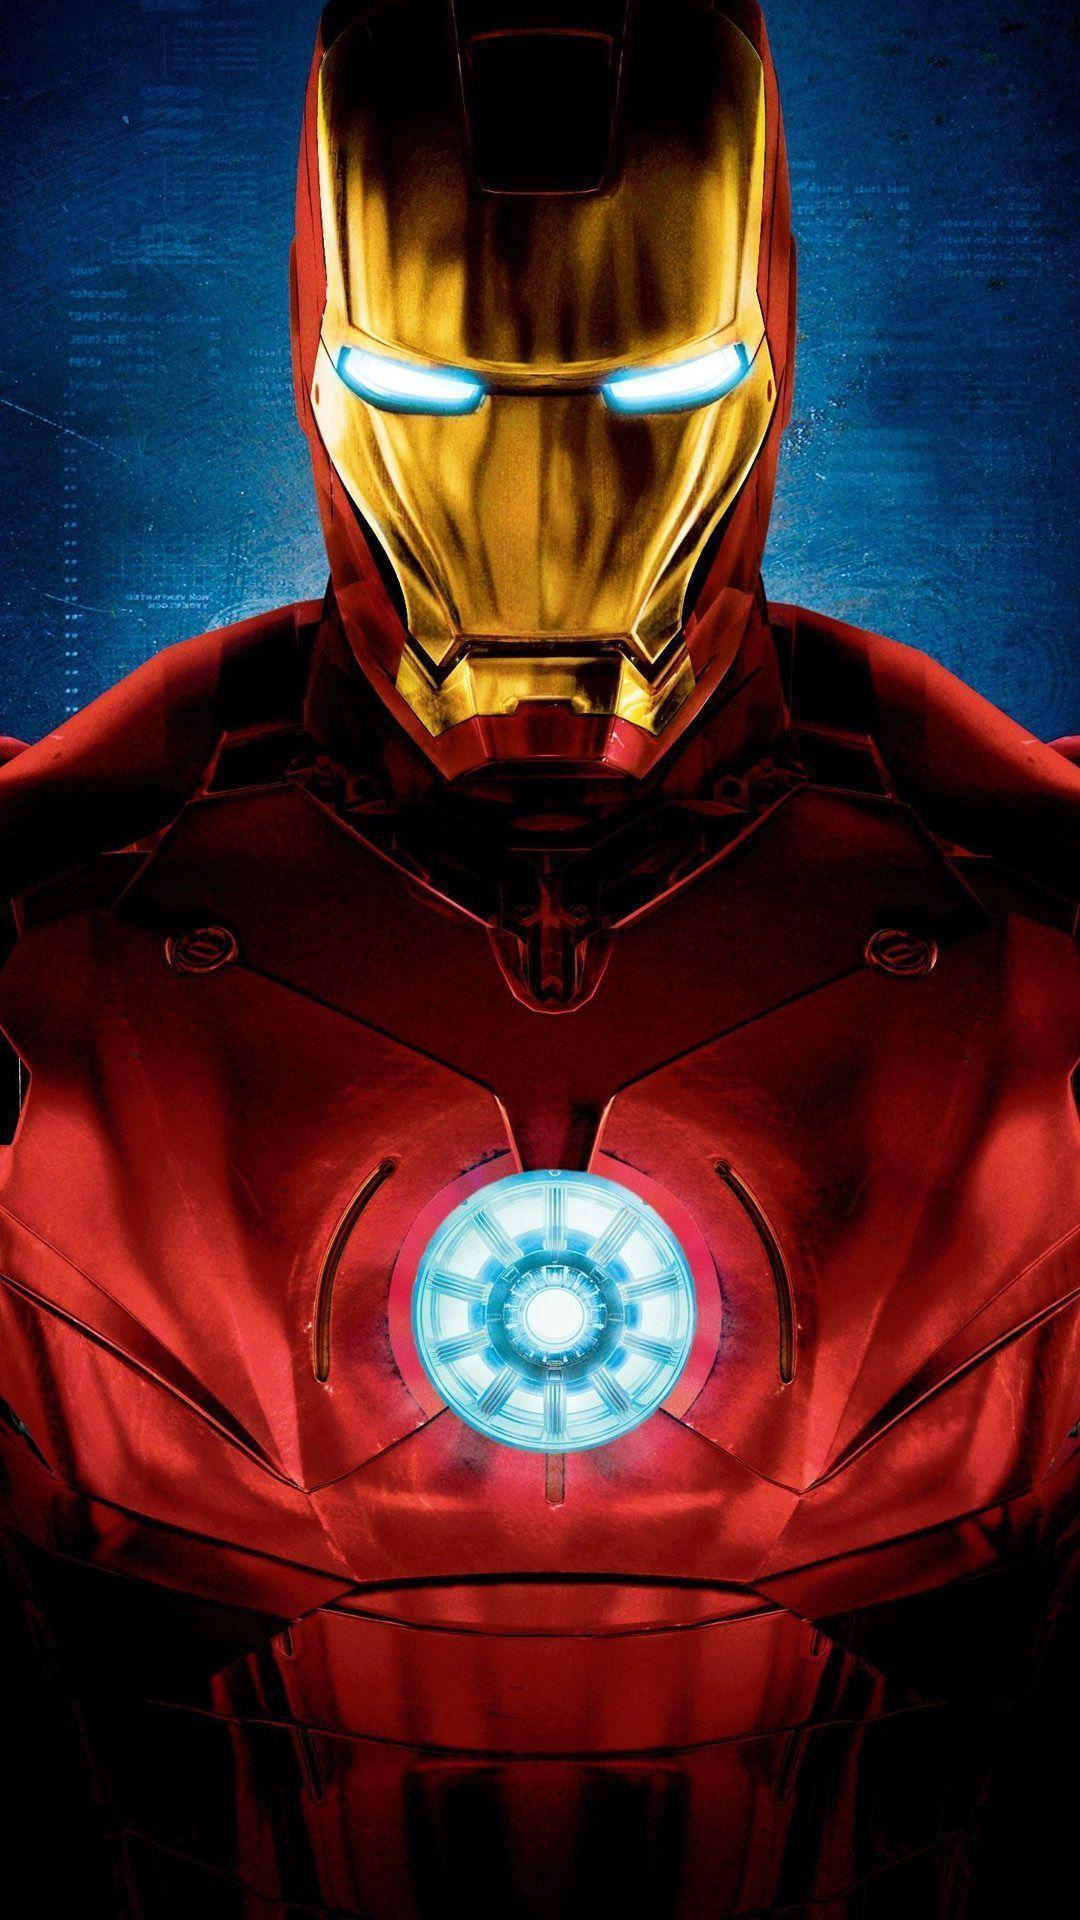 1080x1920 Iron Man Wallpaper Mobile Group 61 Iron Man Hd Wallpaper Iron Man Movie Iron Man Wallpaper 1080p phone iron man hd wallpapers